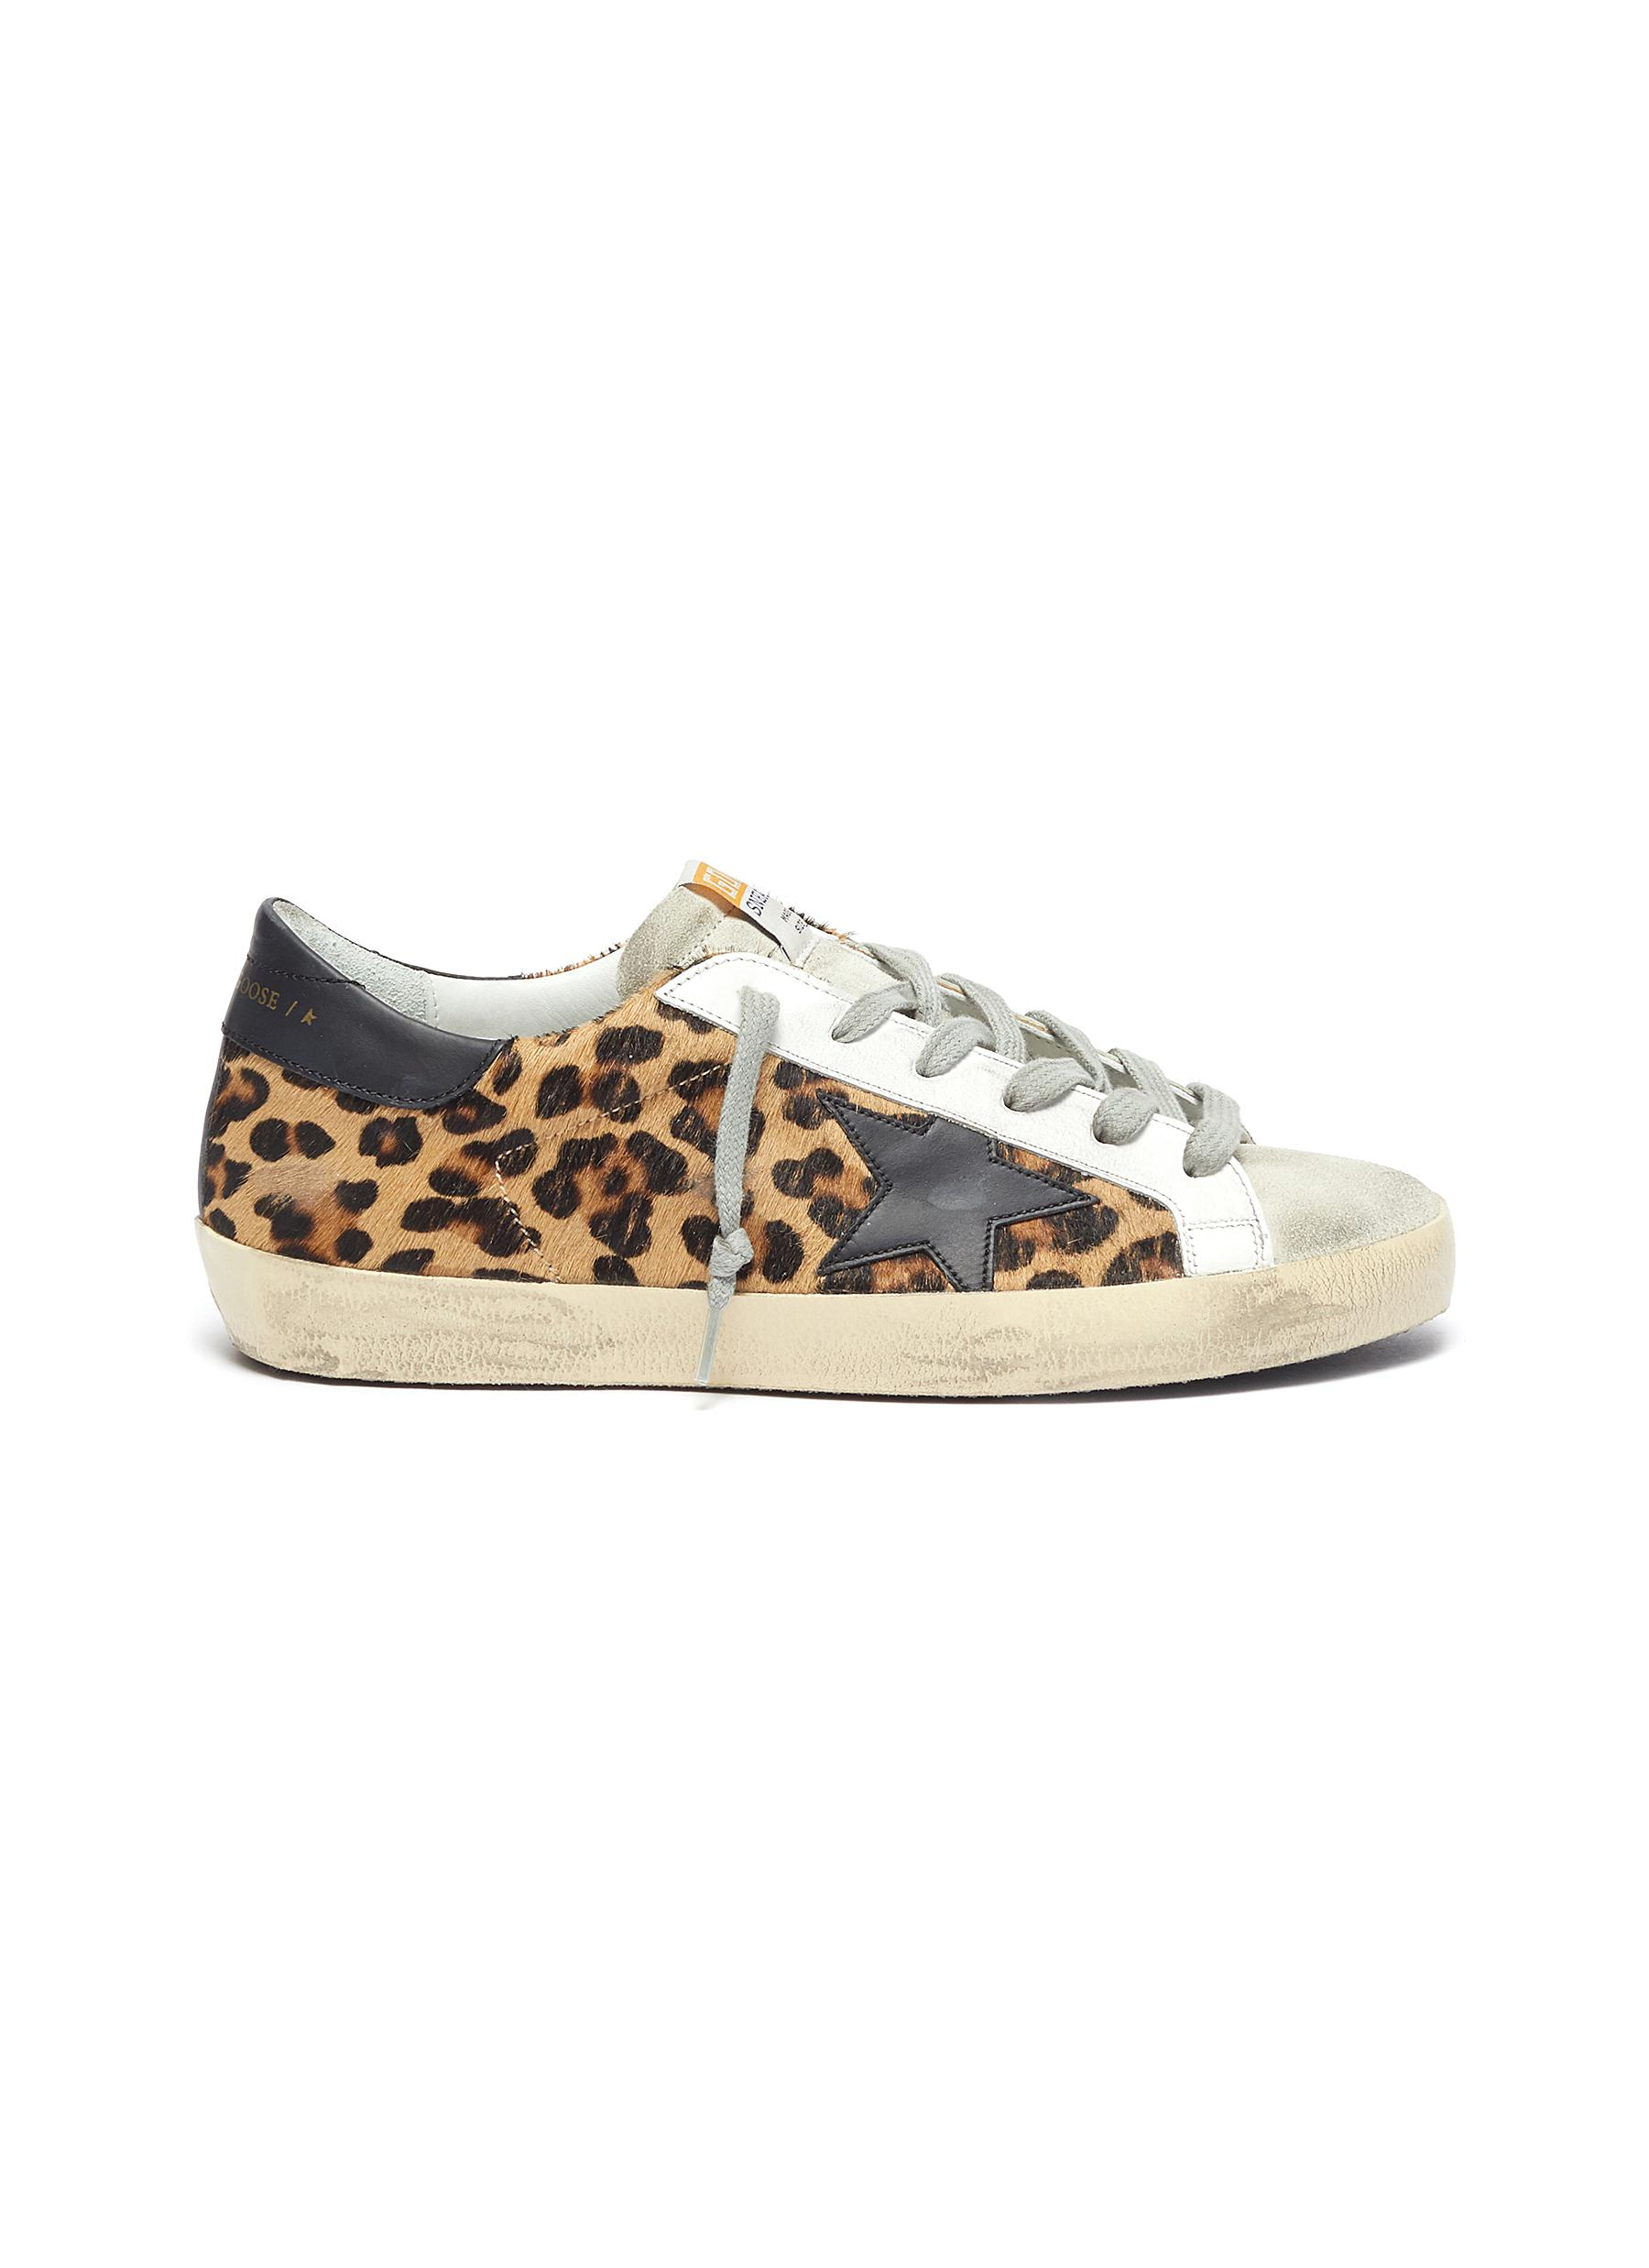 Superstar' leopard print panel suede tongue sneakers